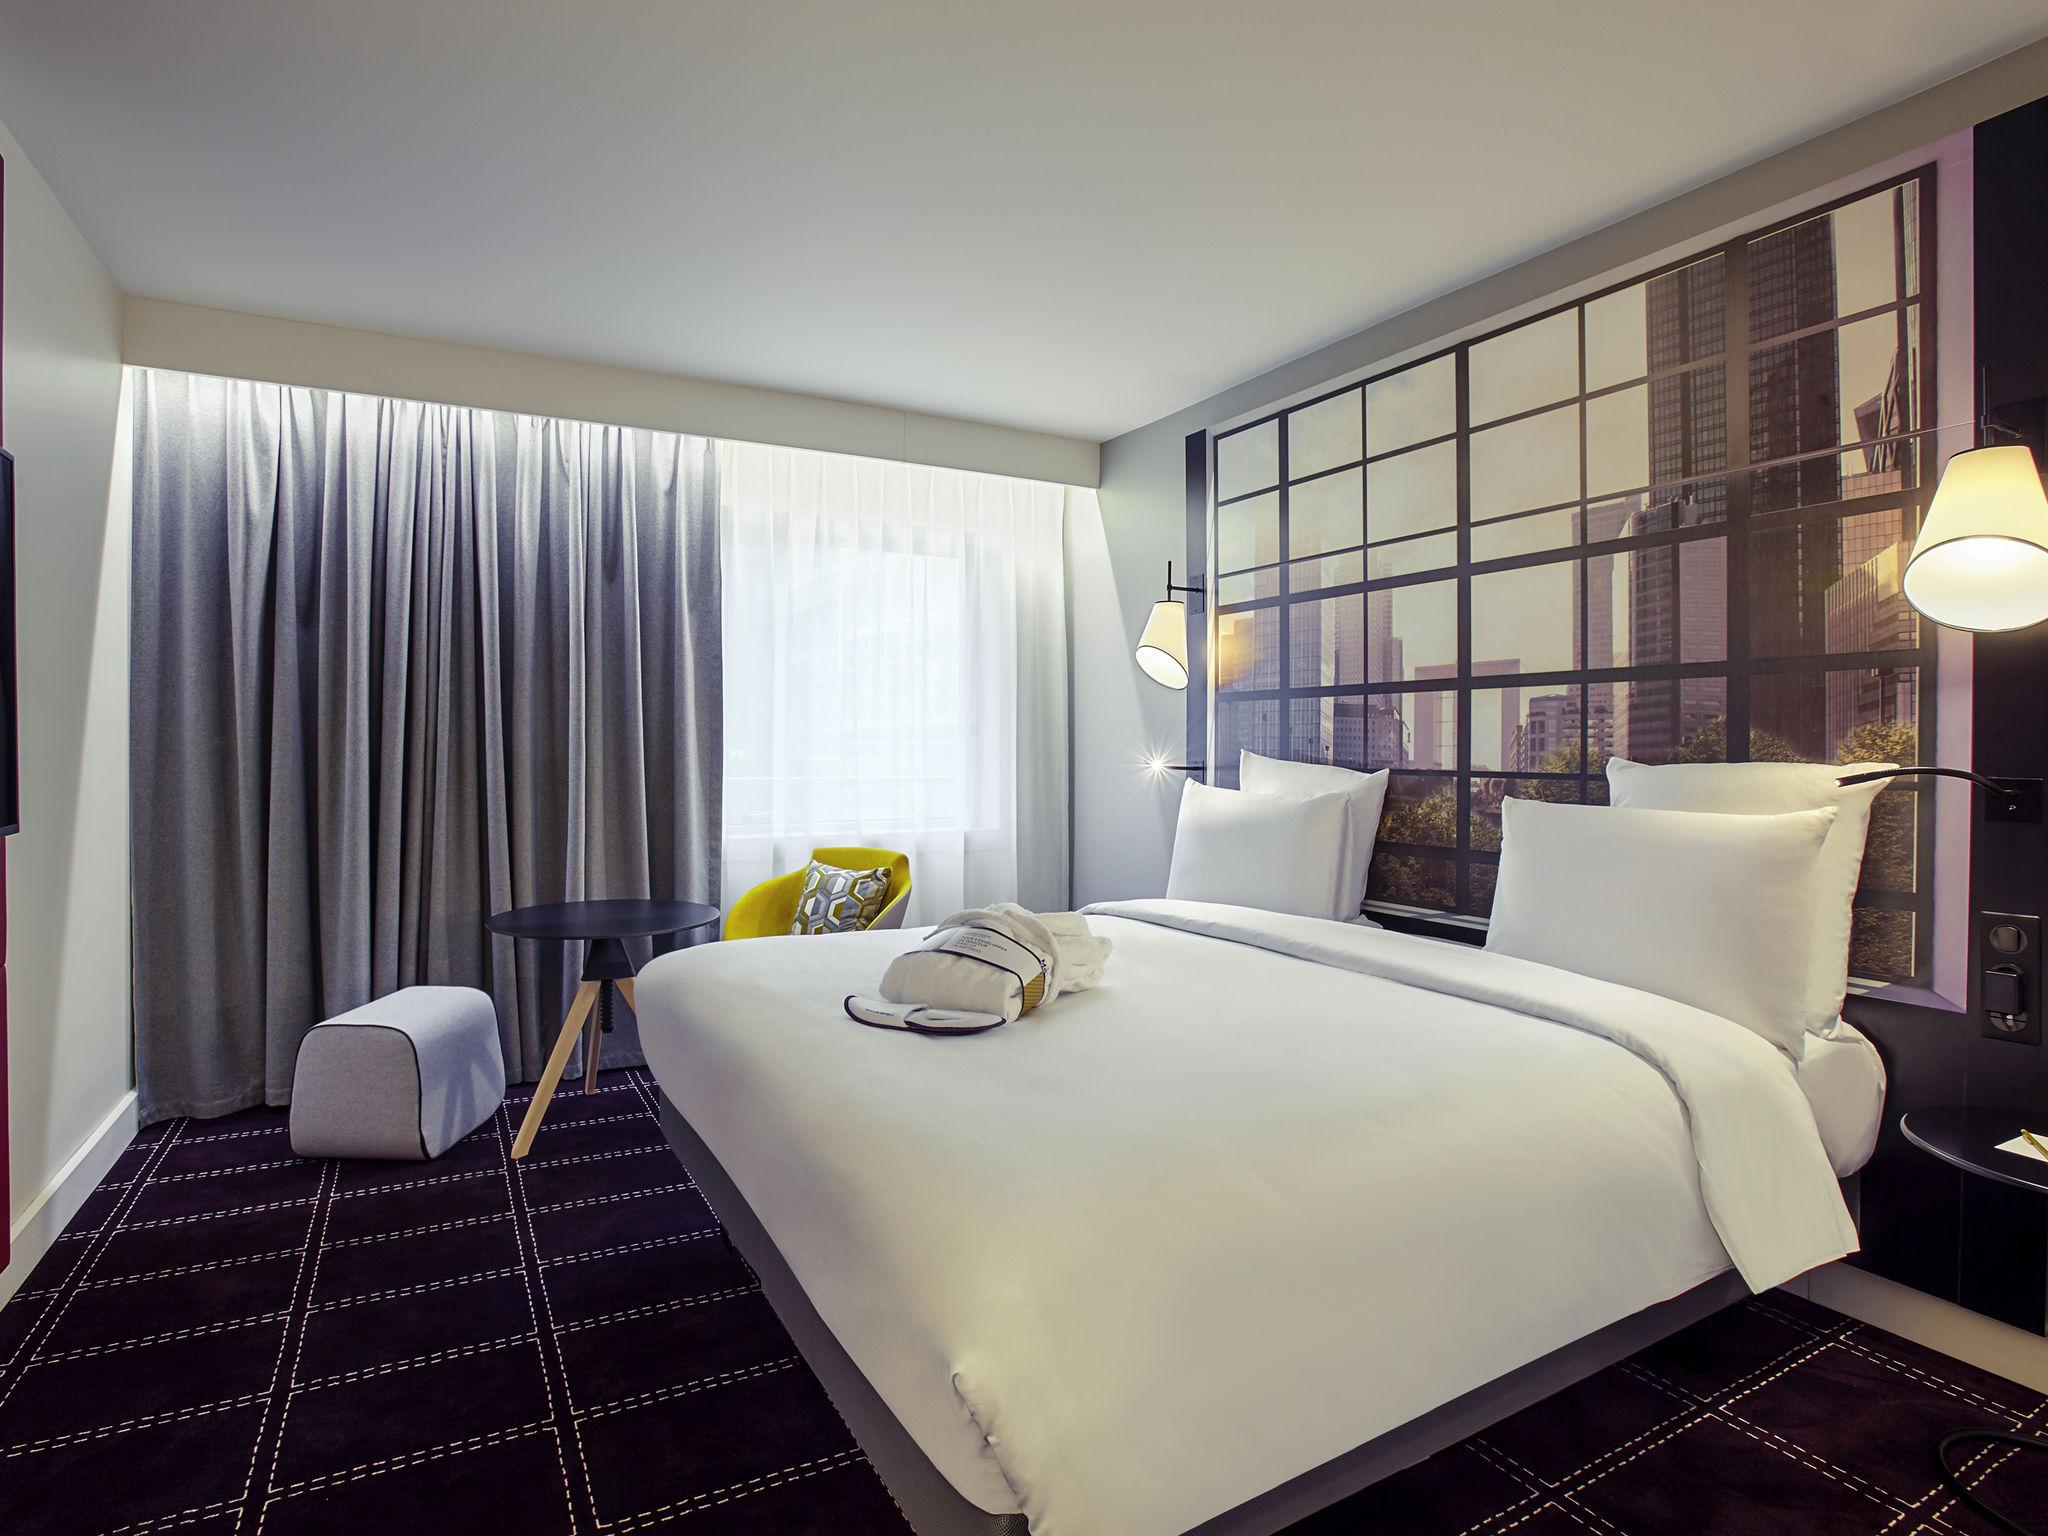 فندق - فندق ومسكن مركيور Mercure لاديفانس بارك